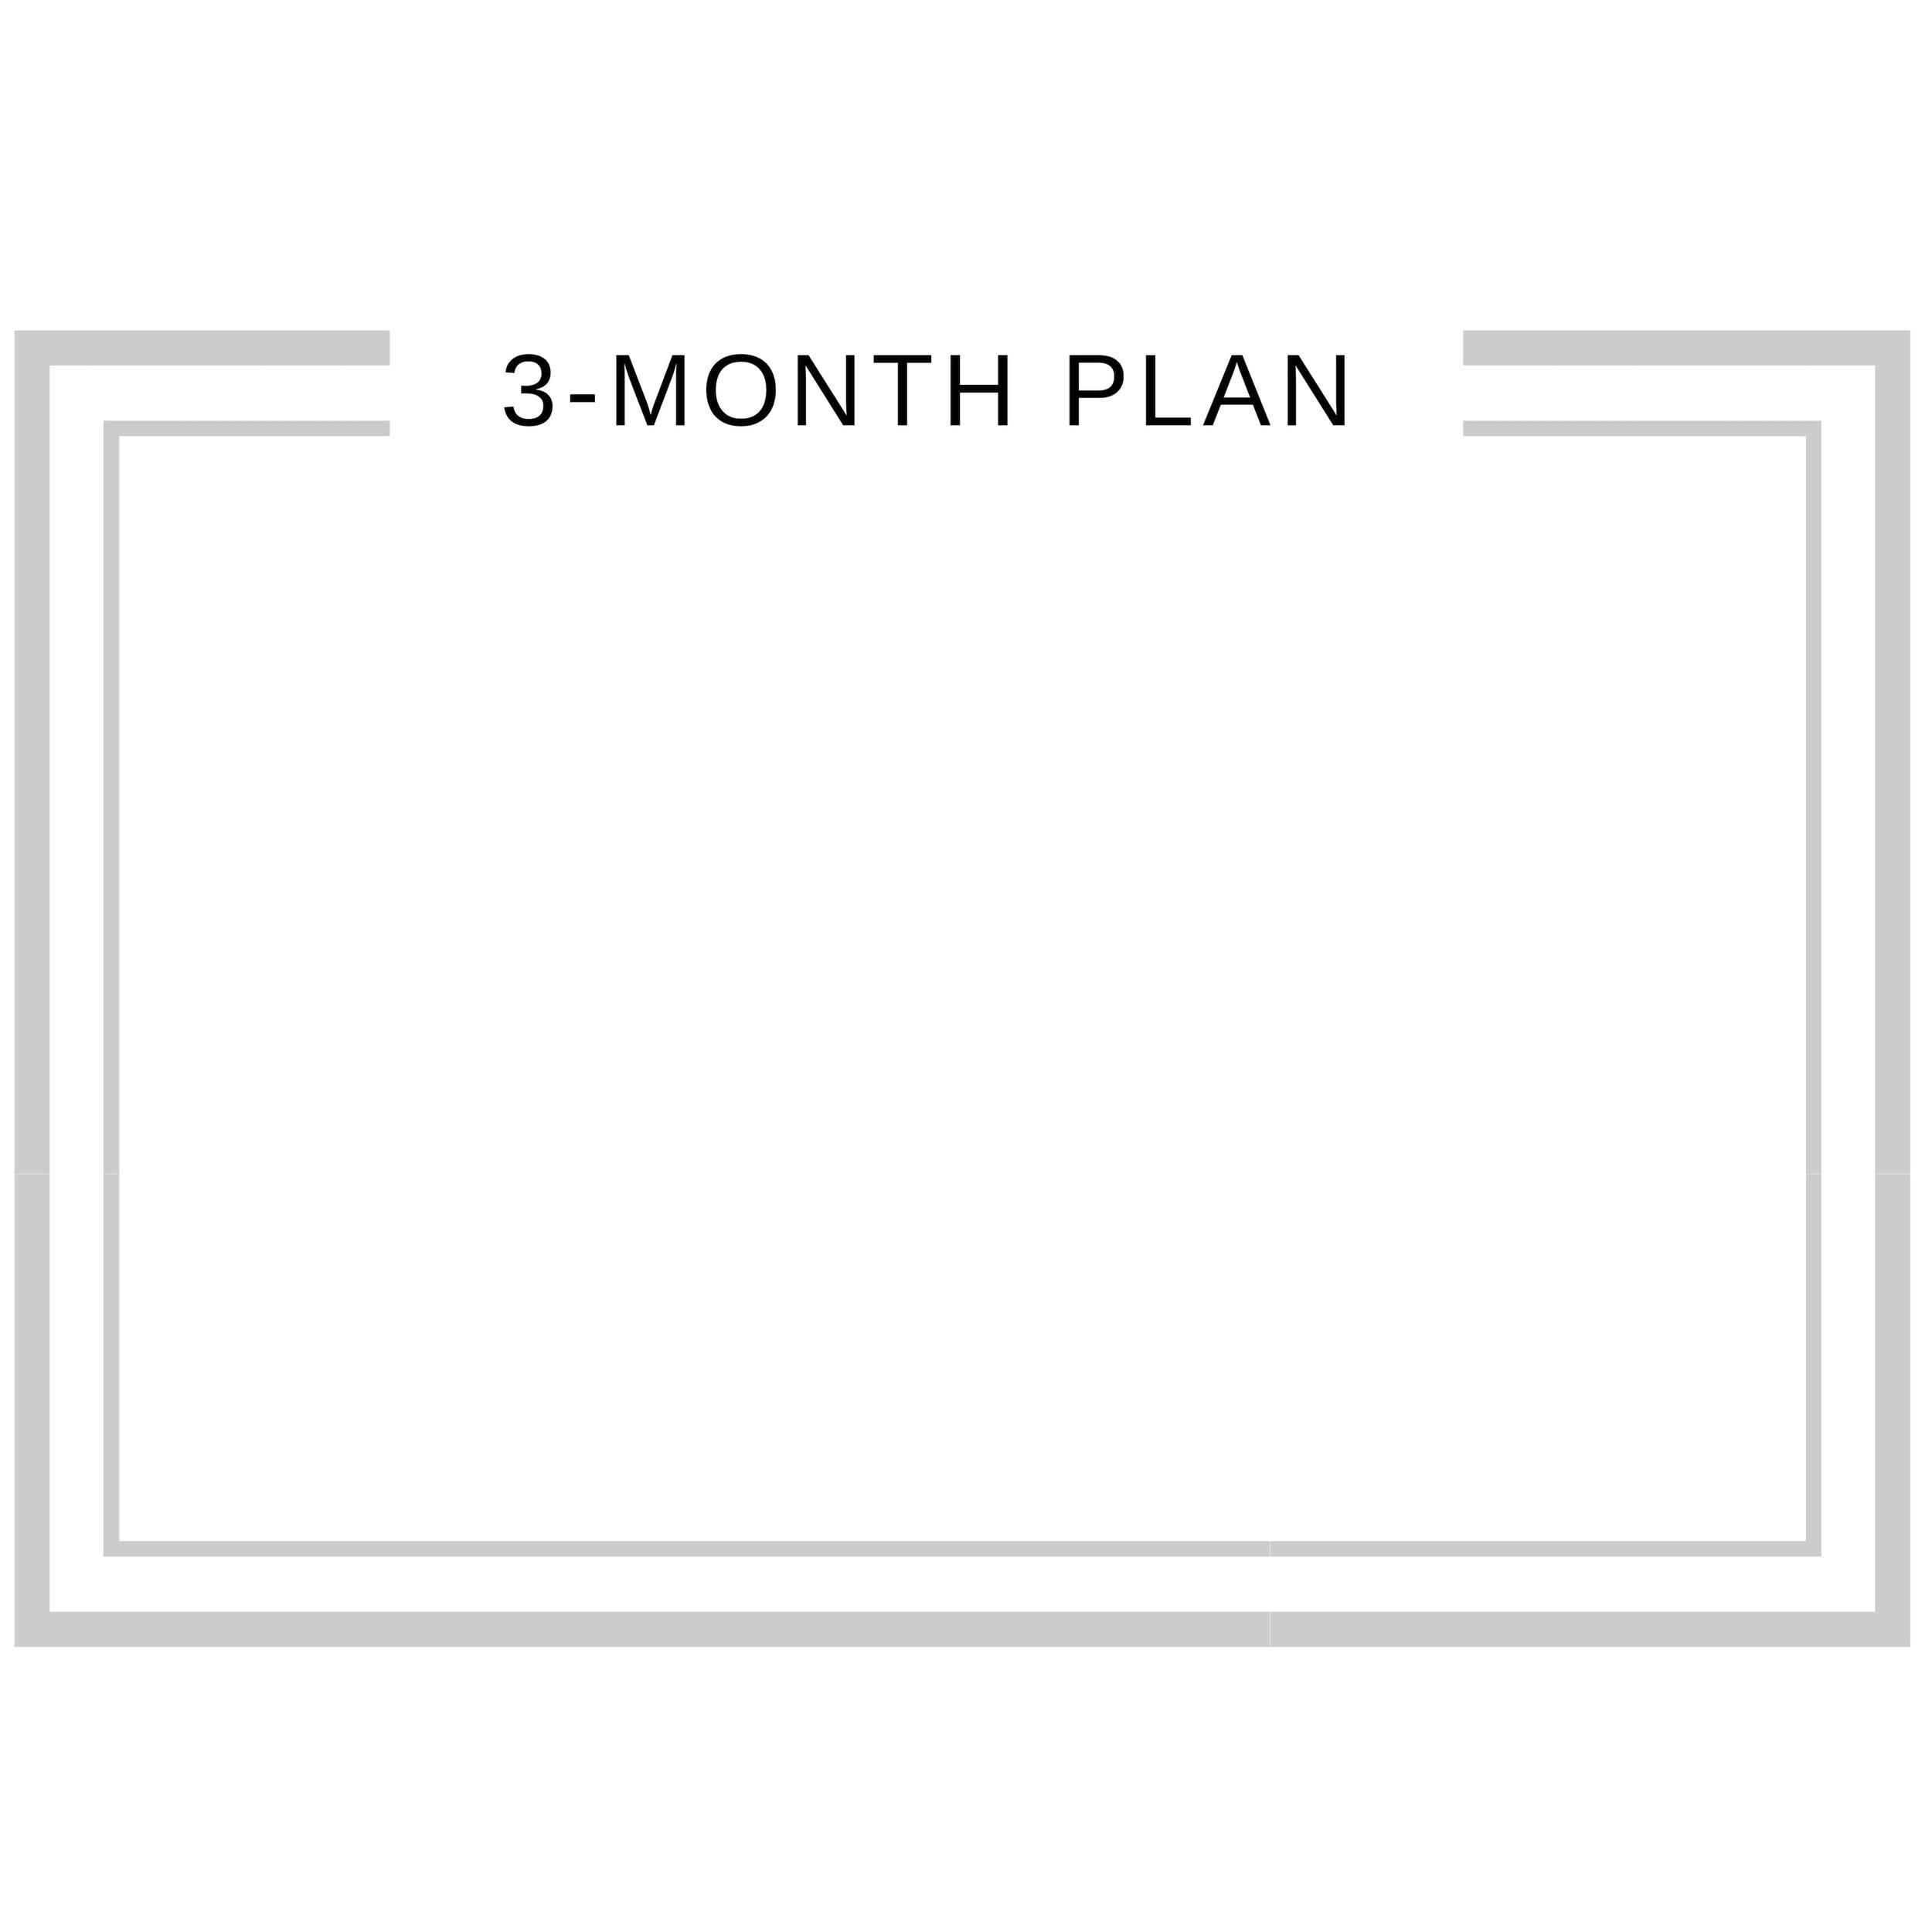 €85.50 - Free shipping€28.50/ box1 premium box/ month during 3 months